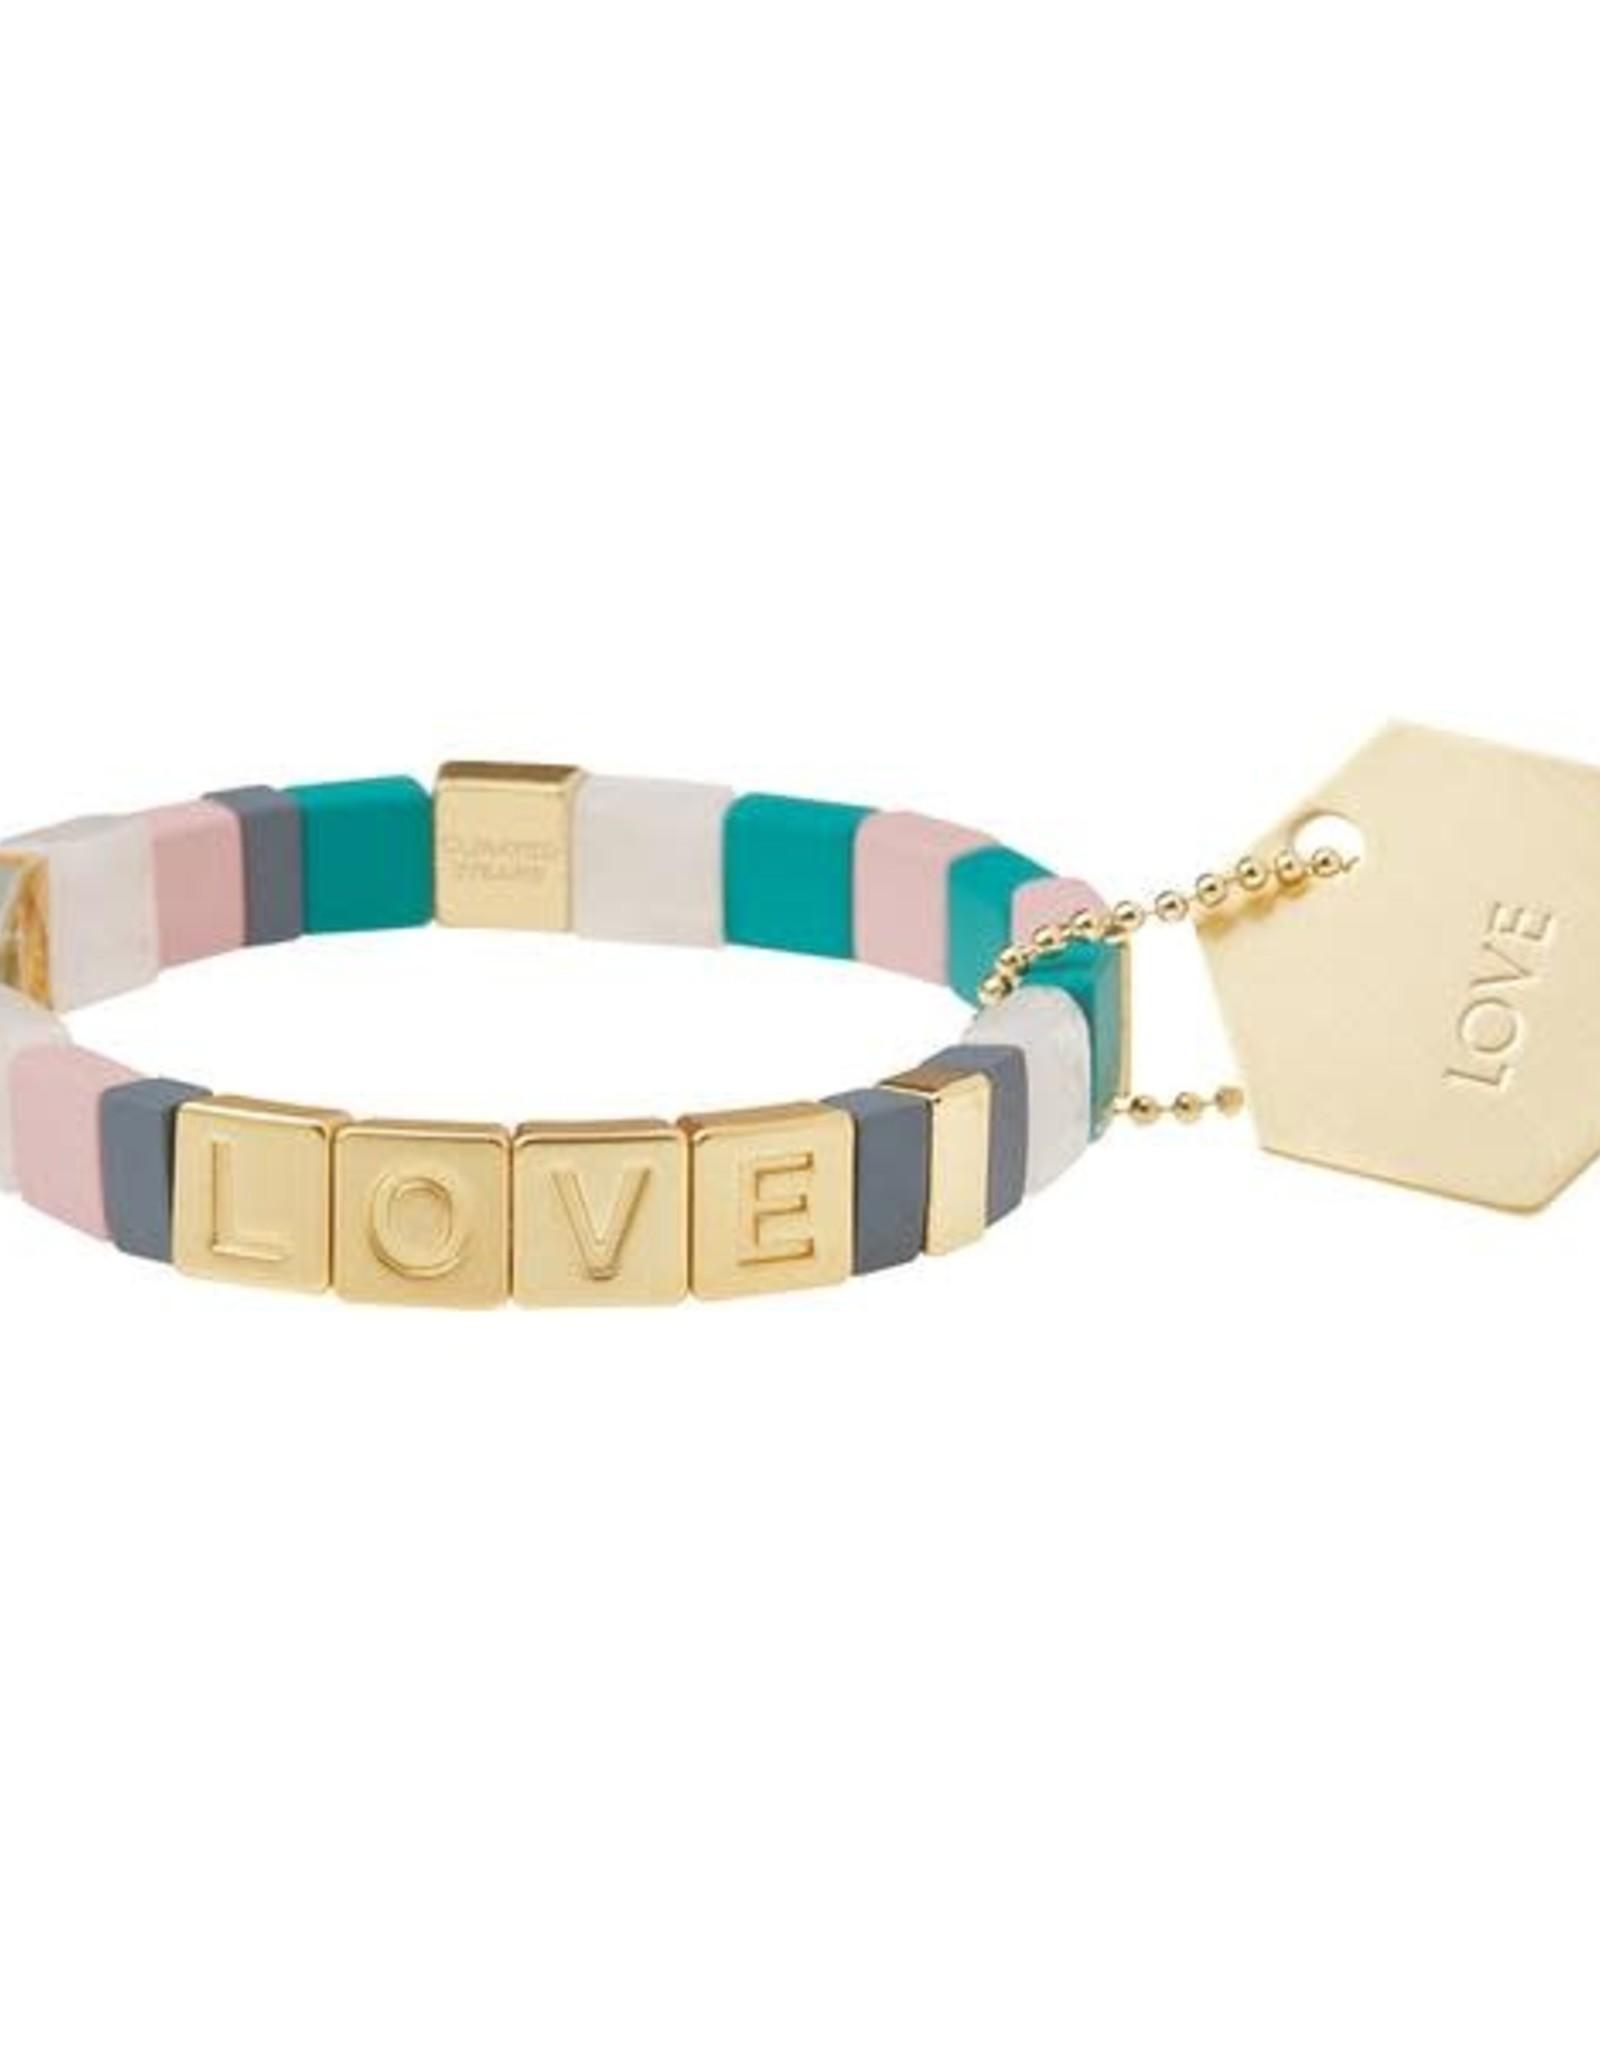 Scout Empower Love gold rose quartz labradorite